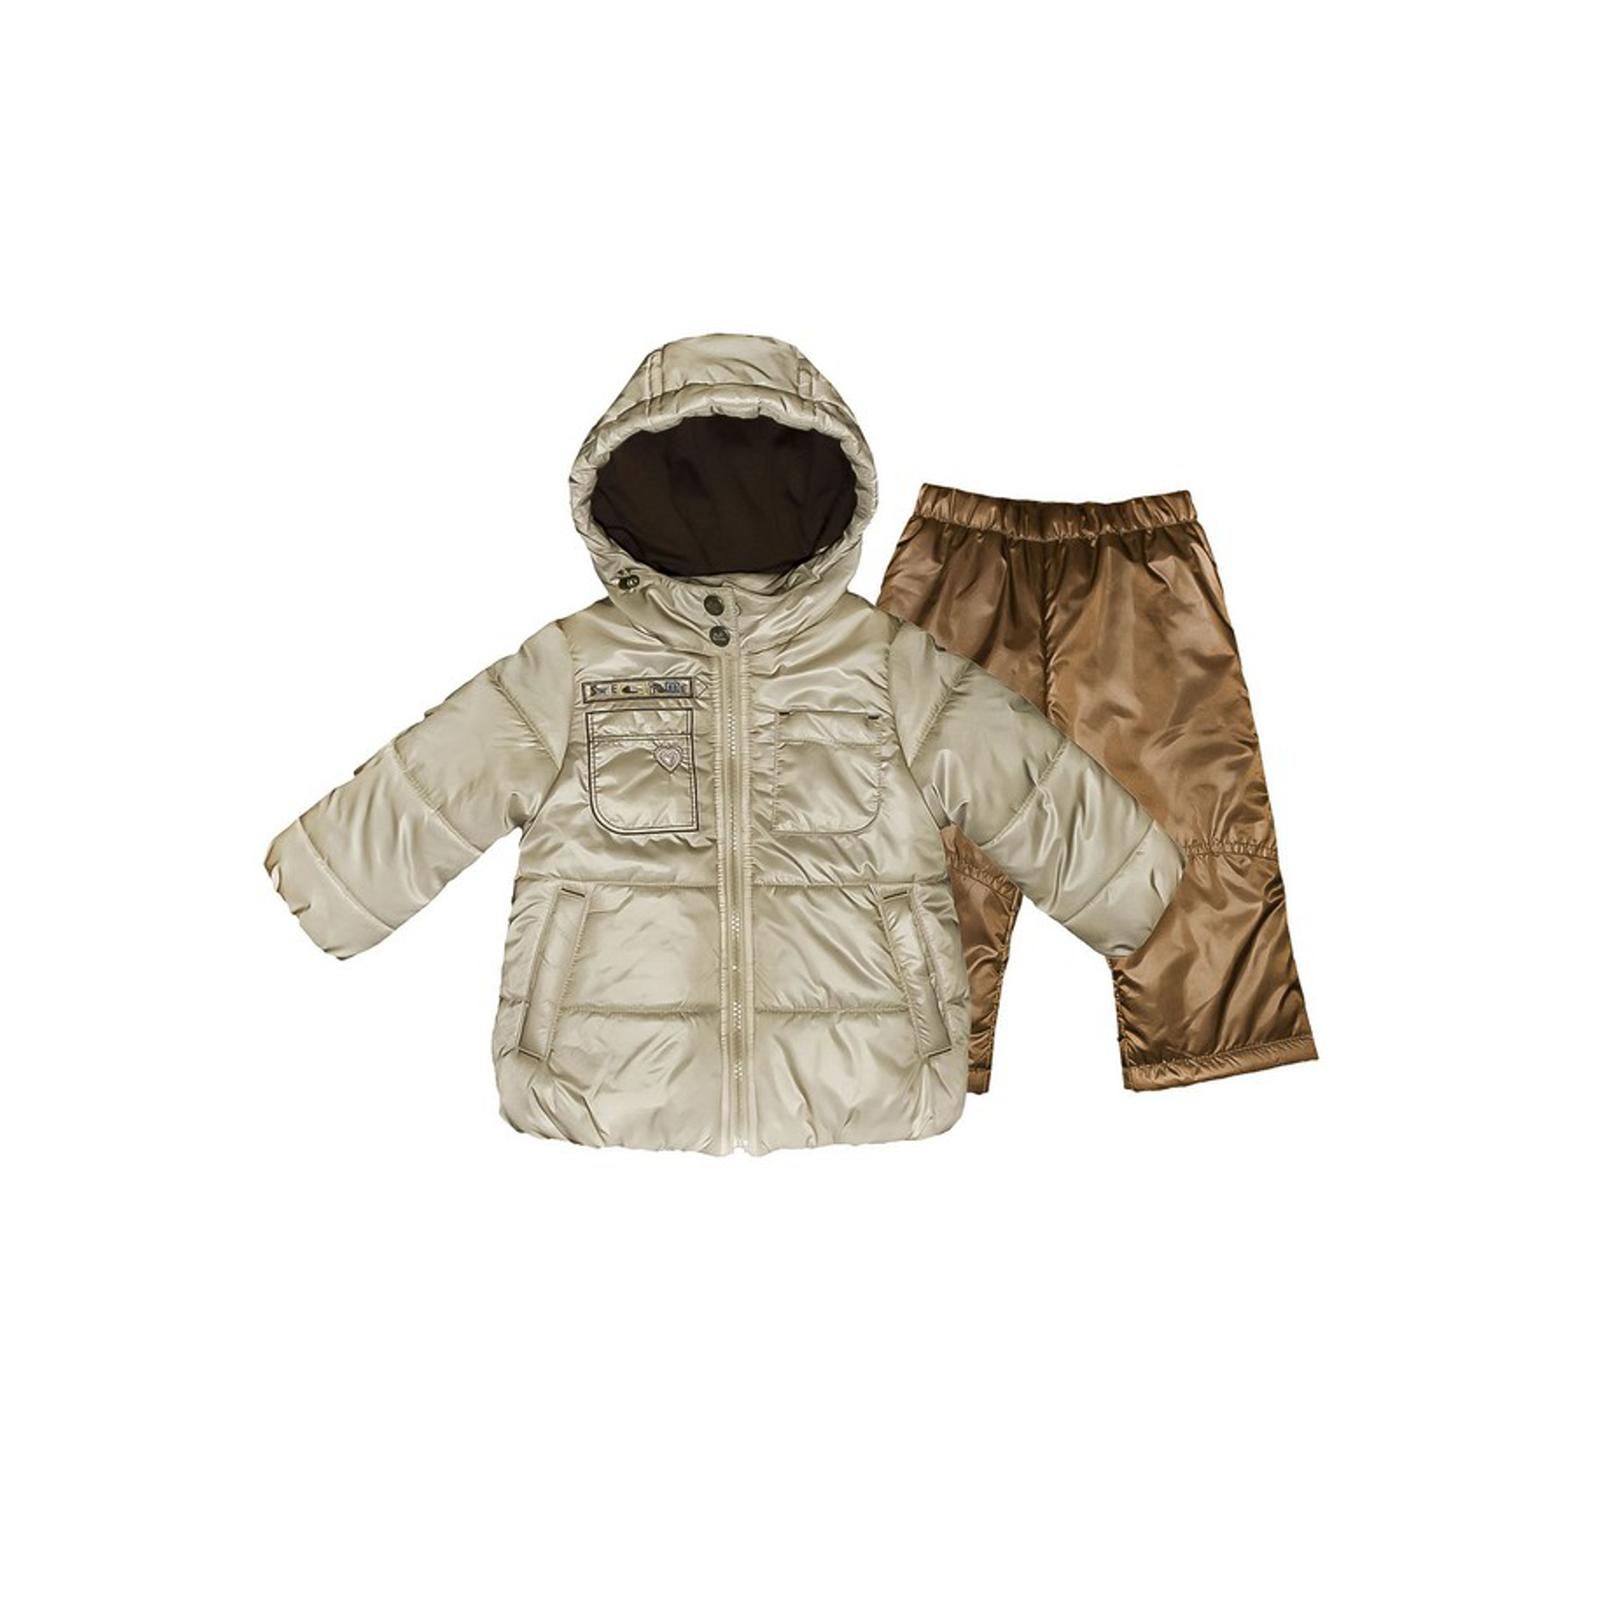 Комплект Бимоша куртка+брюки 24-36 мес.